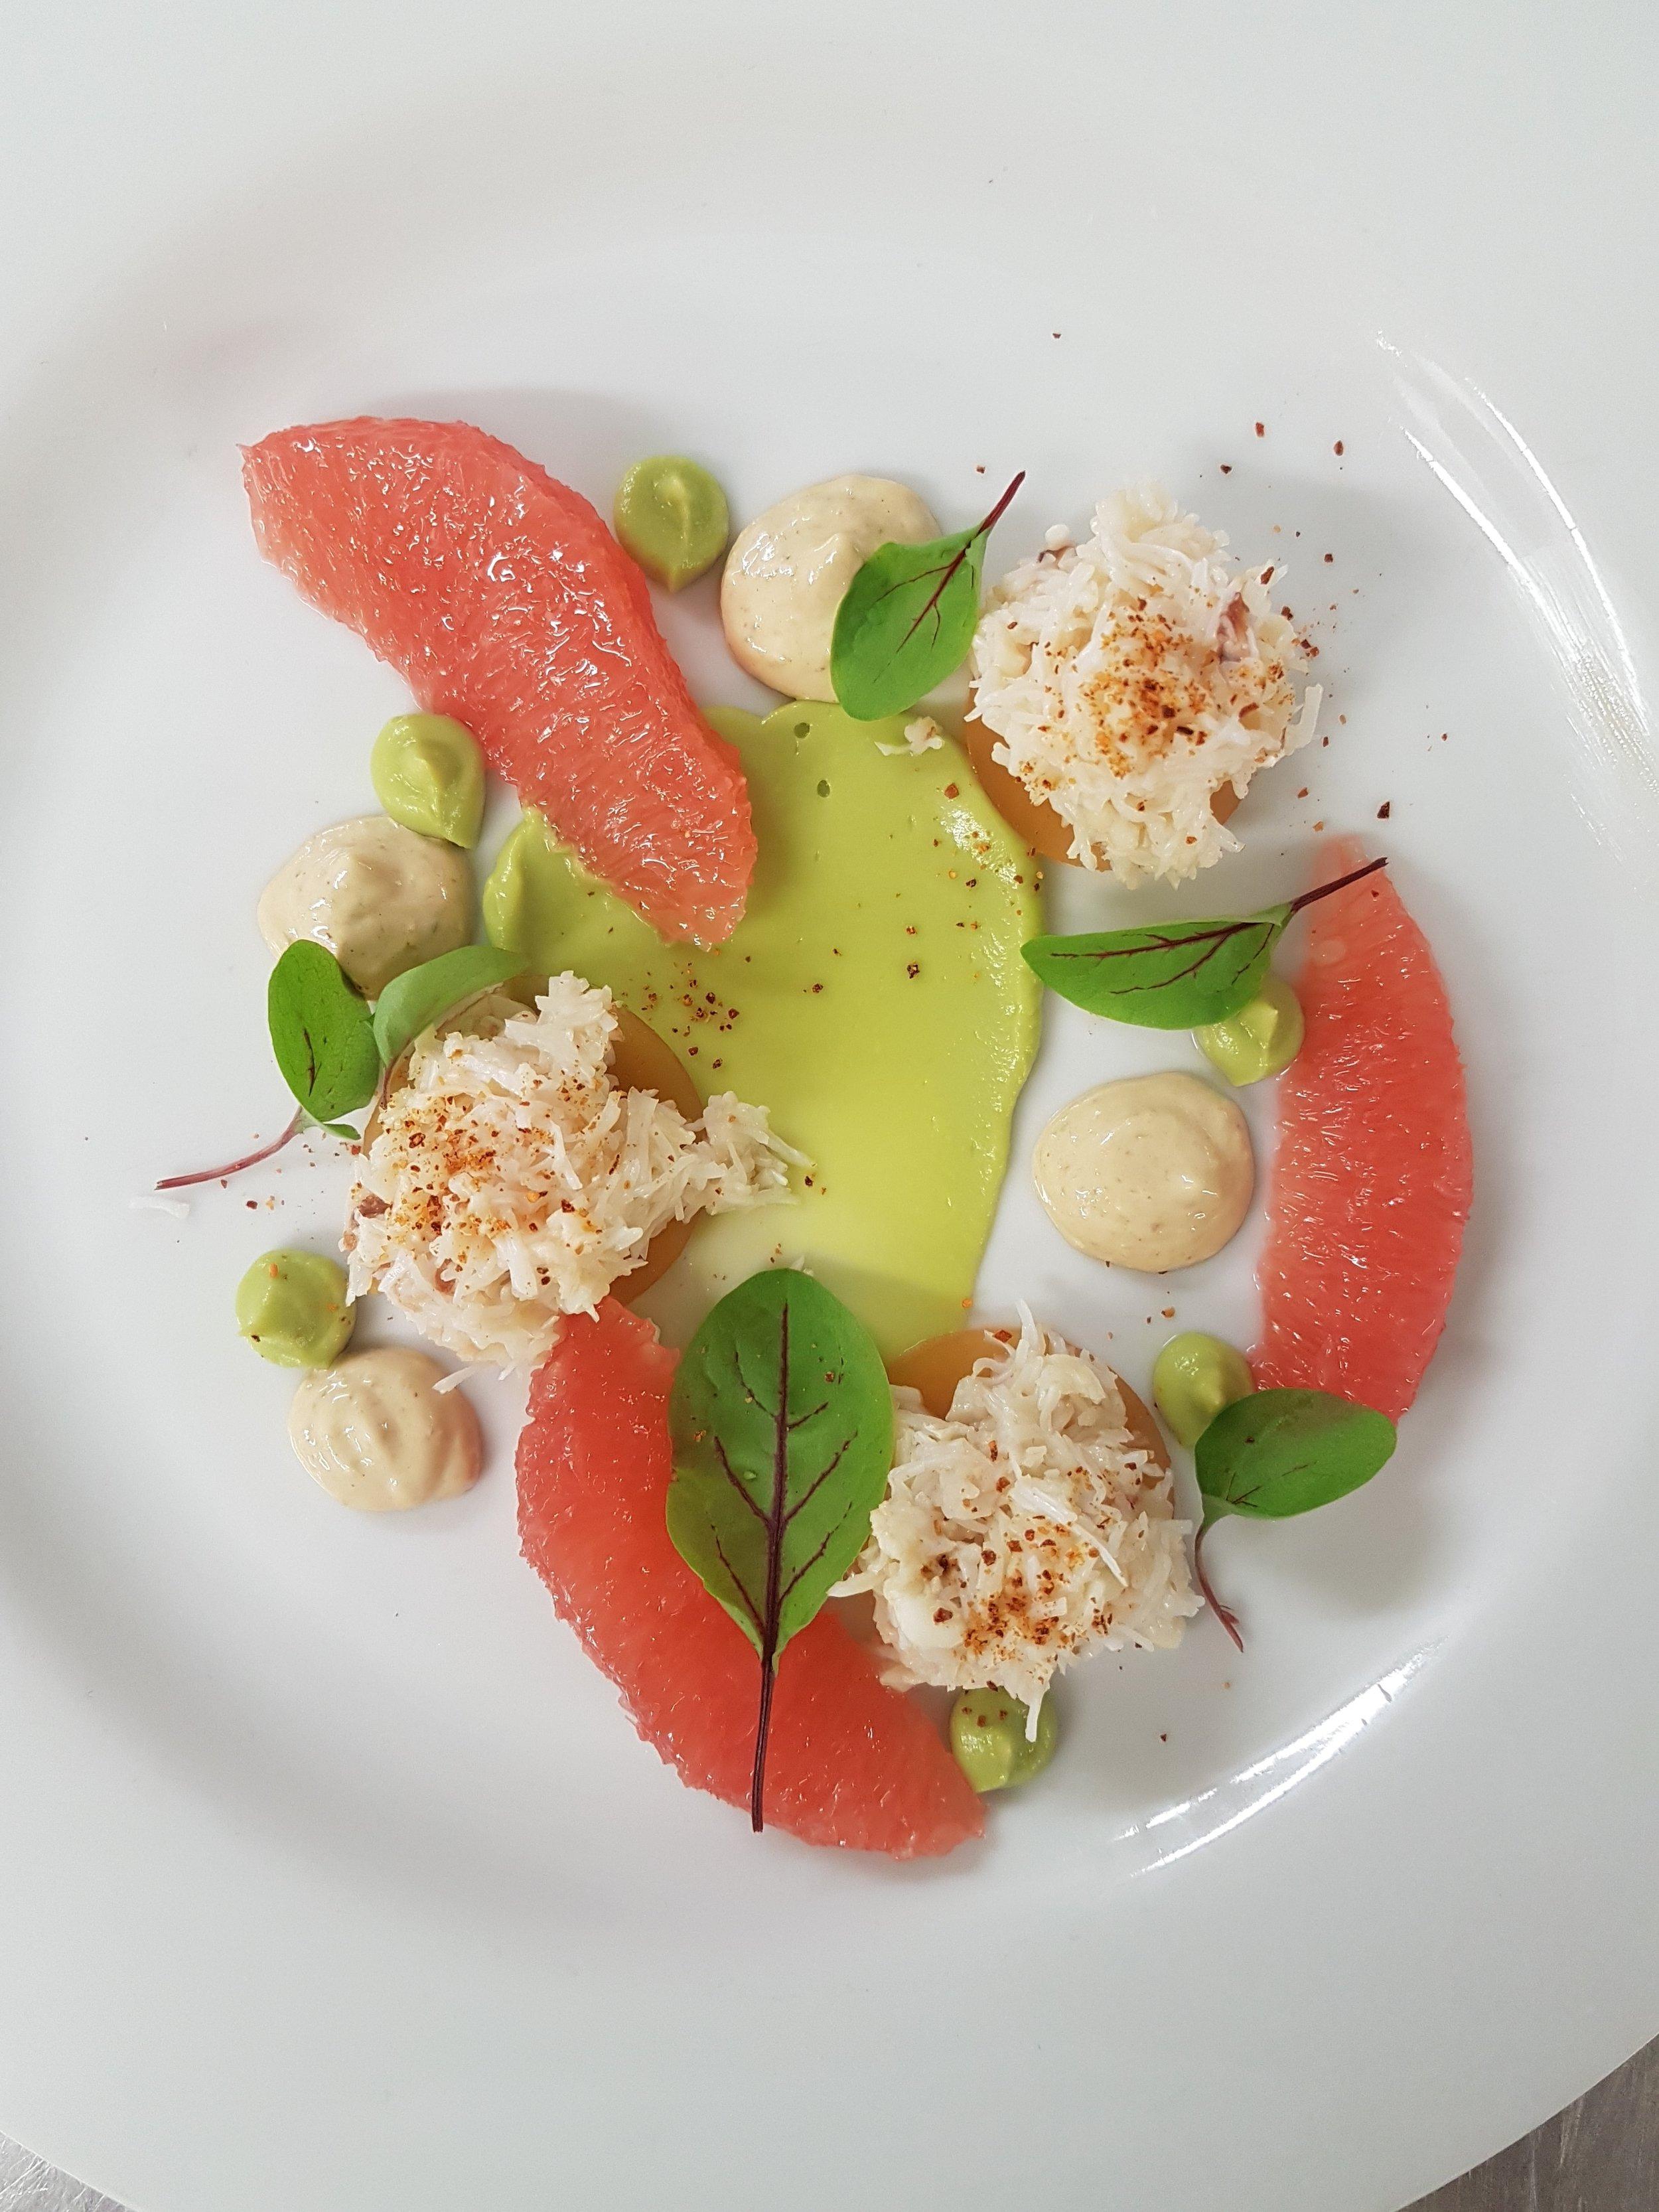 Crab and grapefruit salad with avocado puree.jpg